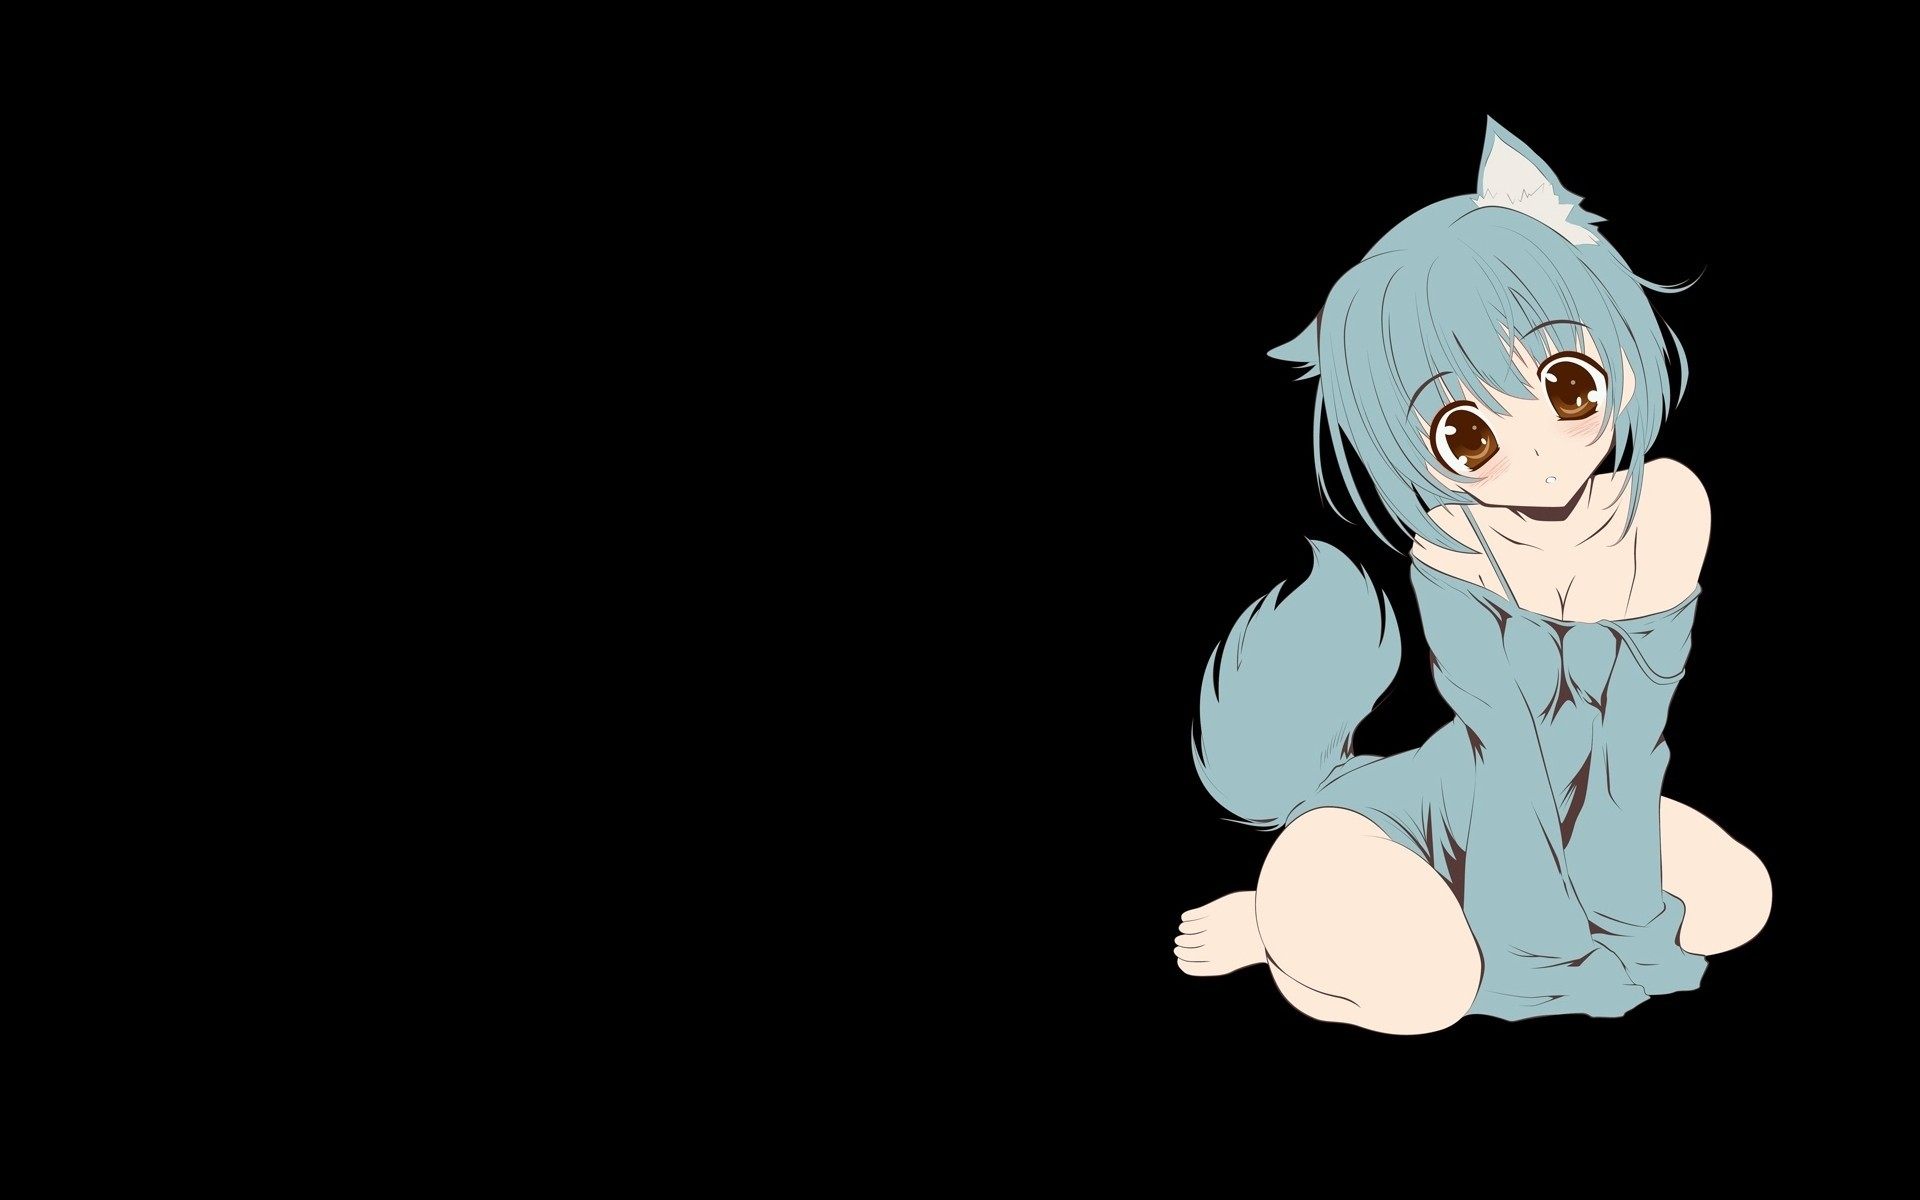 Furry fandom wallpaper 48 images - Anime wallpaper black background ...